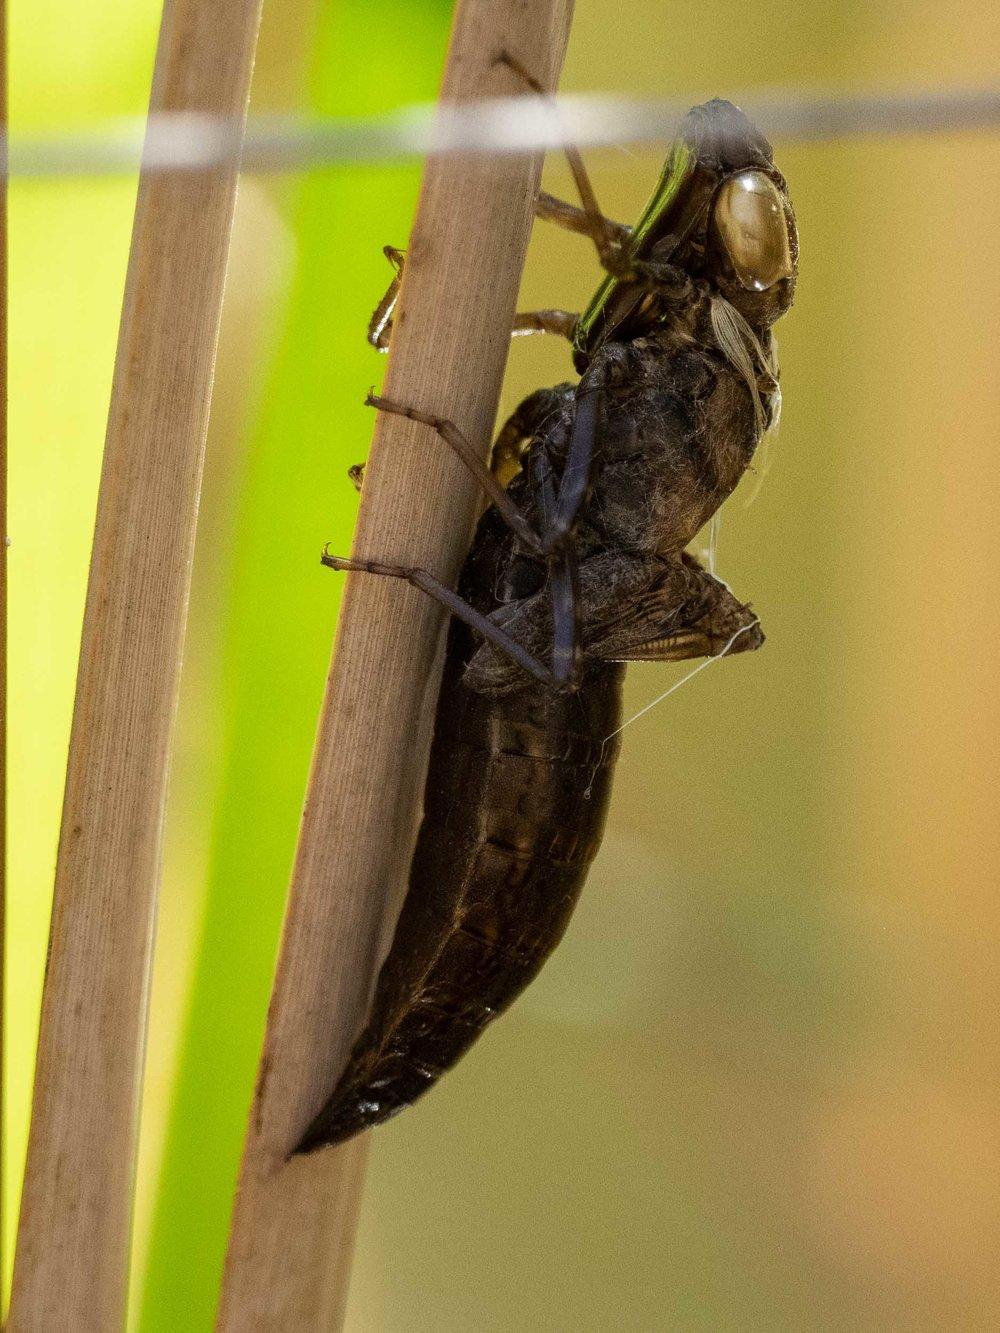 28/12/18: Shed exoskeleton of unknown dragonfly larva